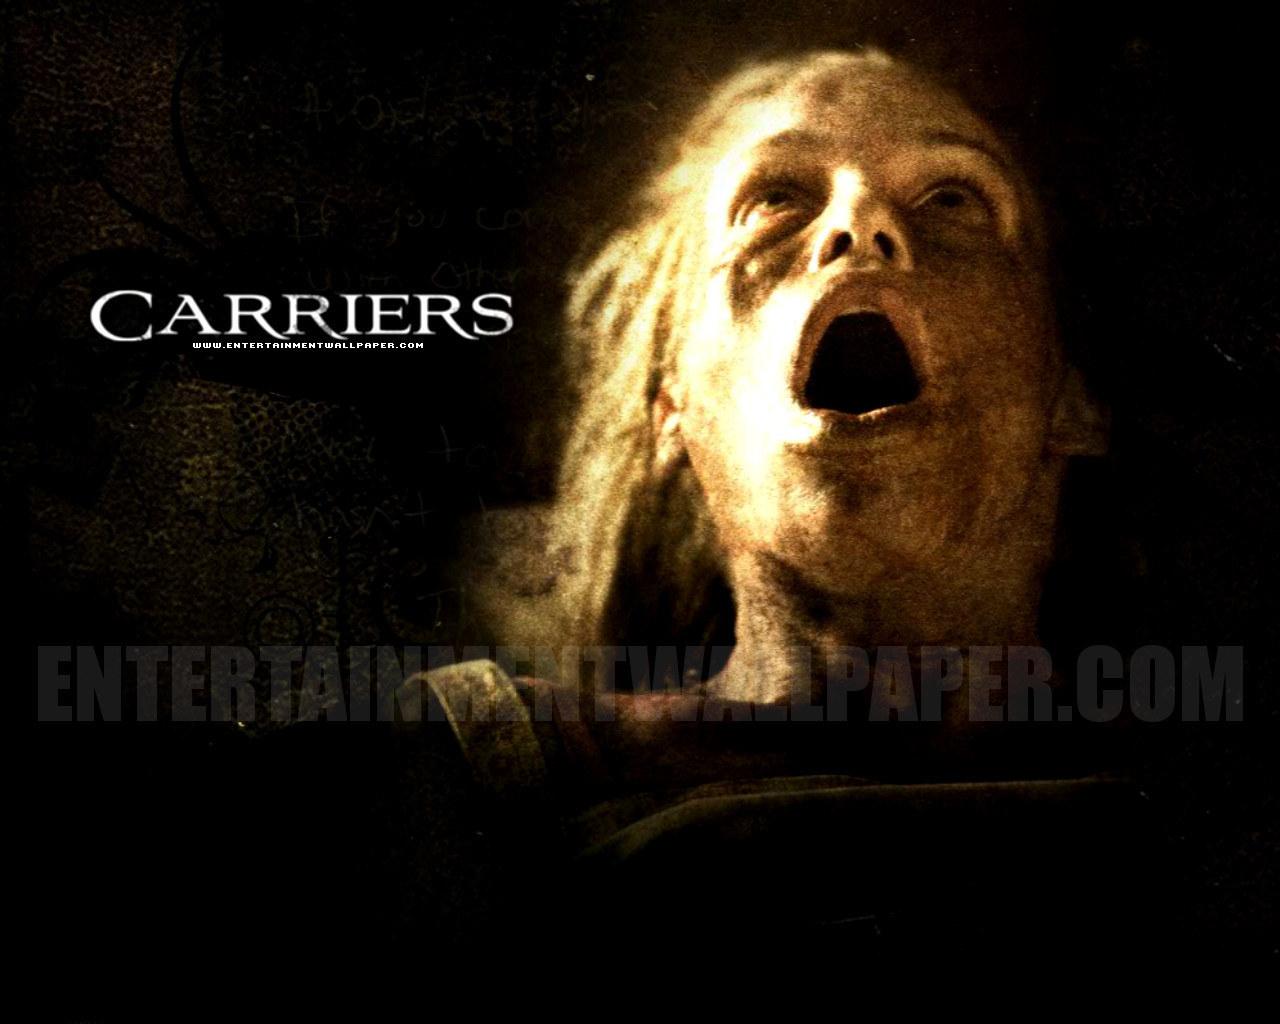 Carriers (2009) achtergronden